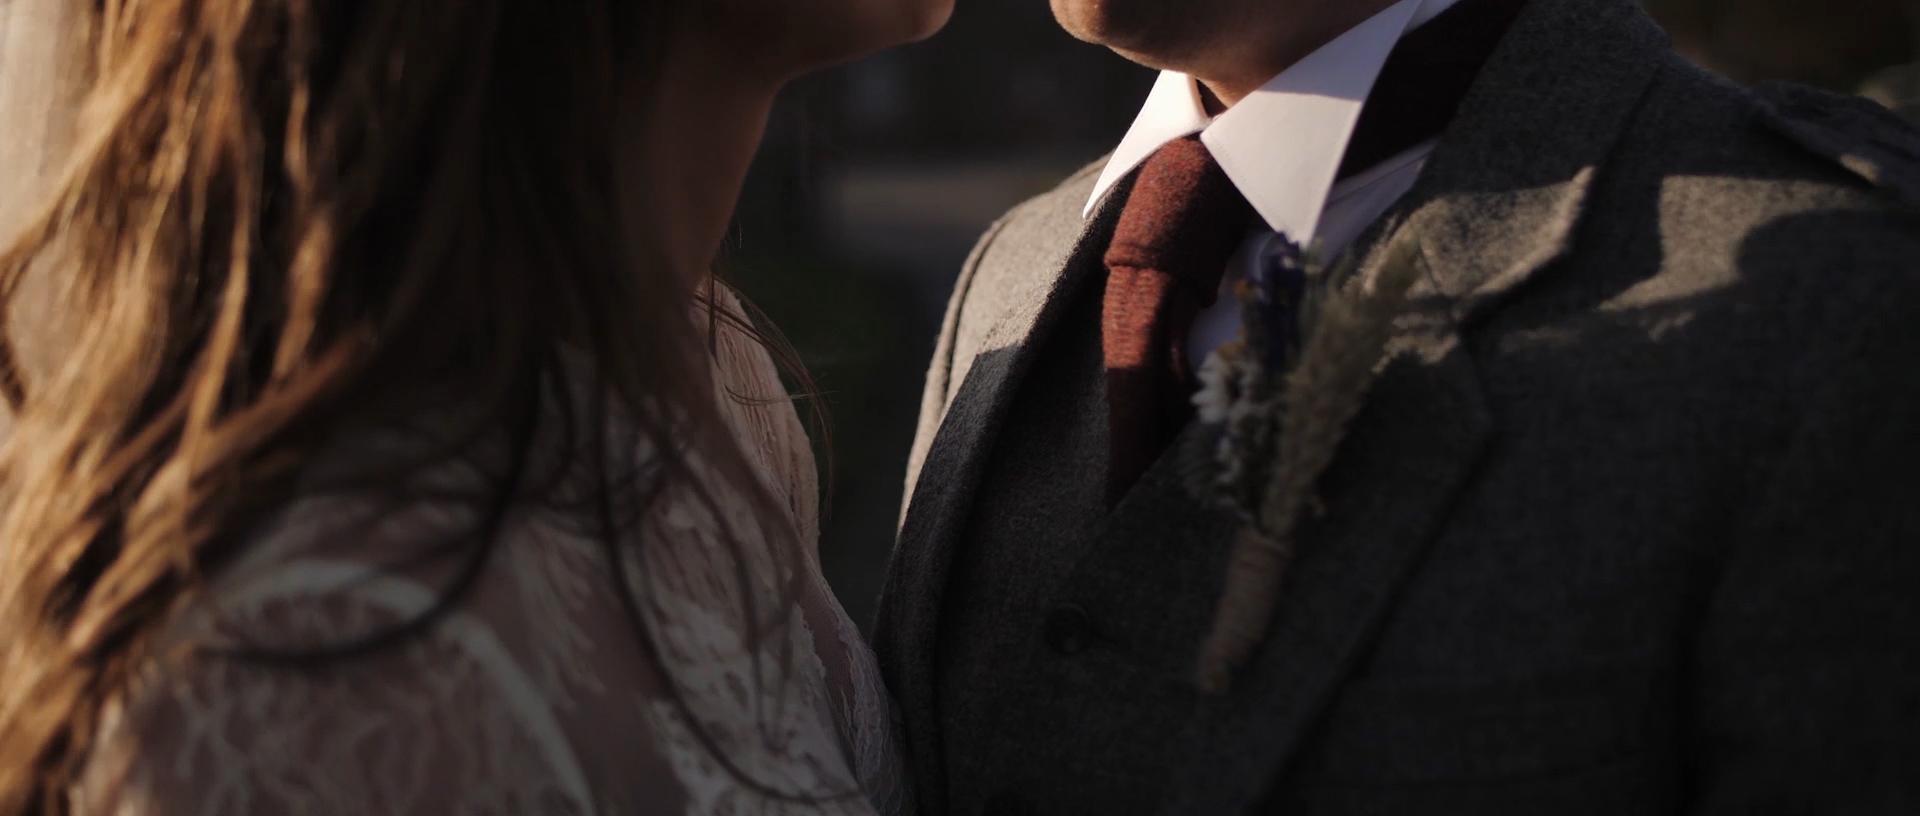 gleddoch-hotel-wedding-videographer_LL_04.jpg